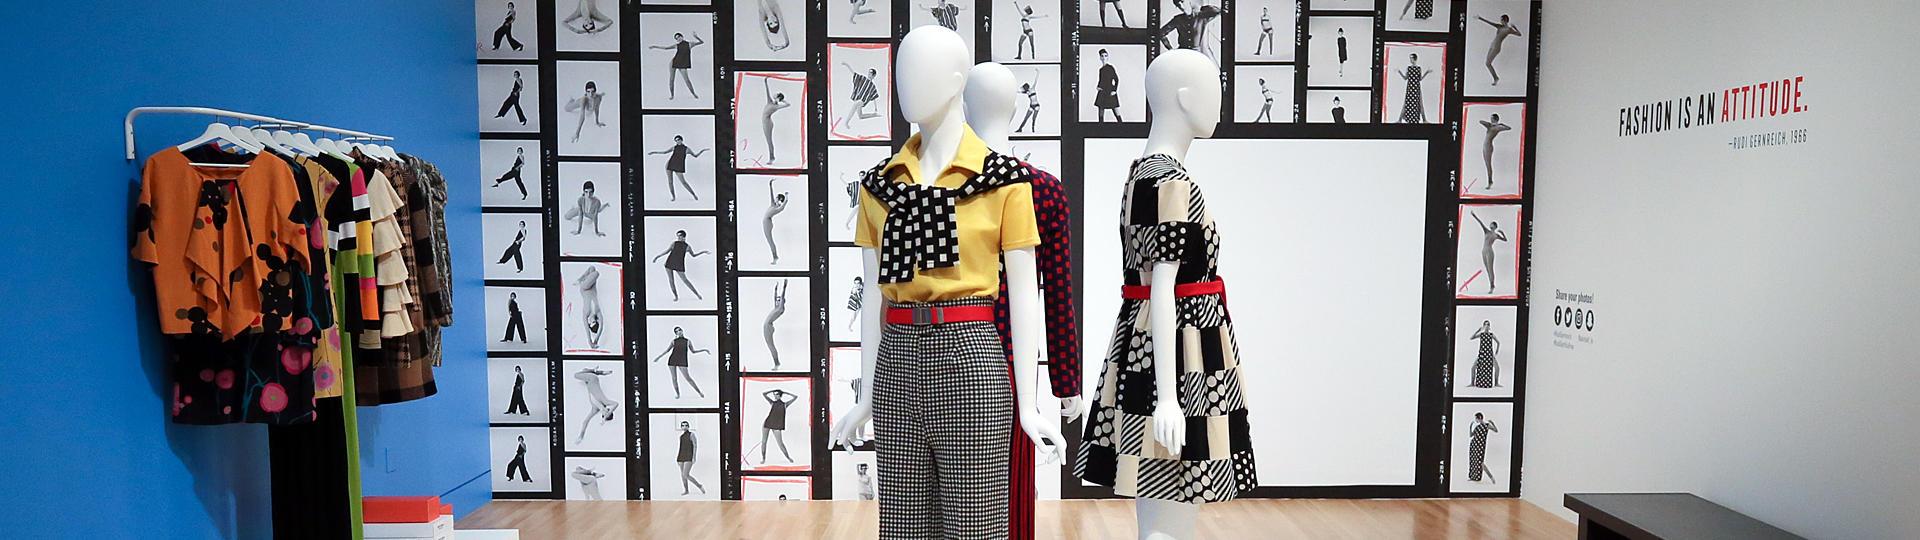 fearless-fashion